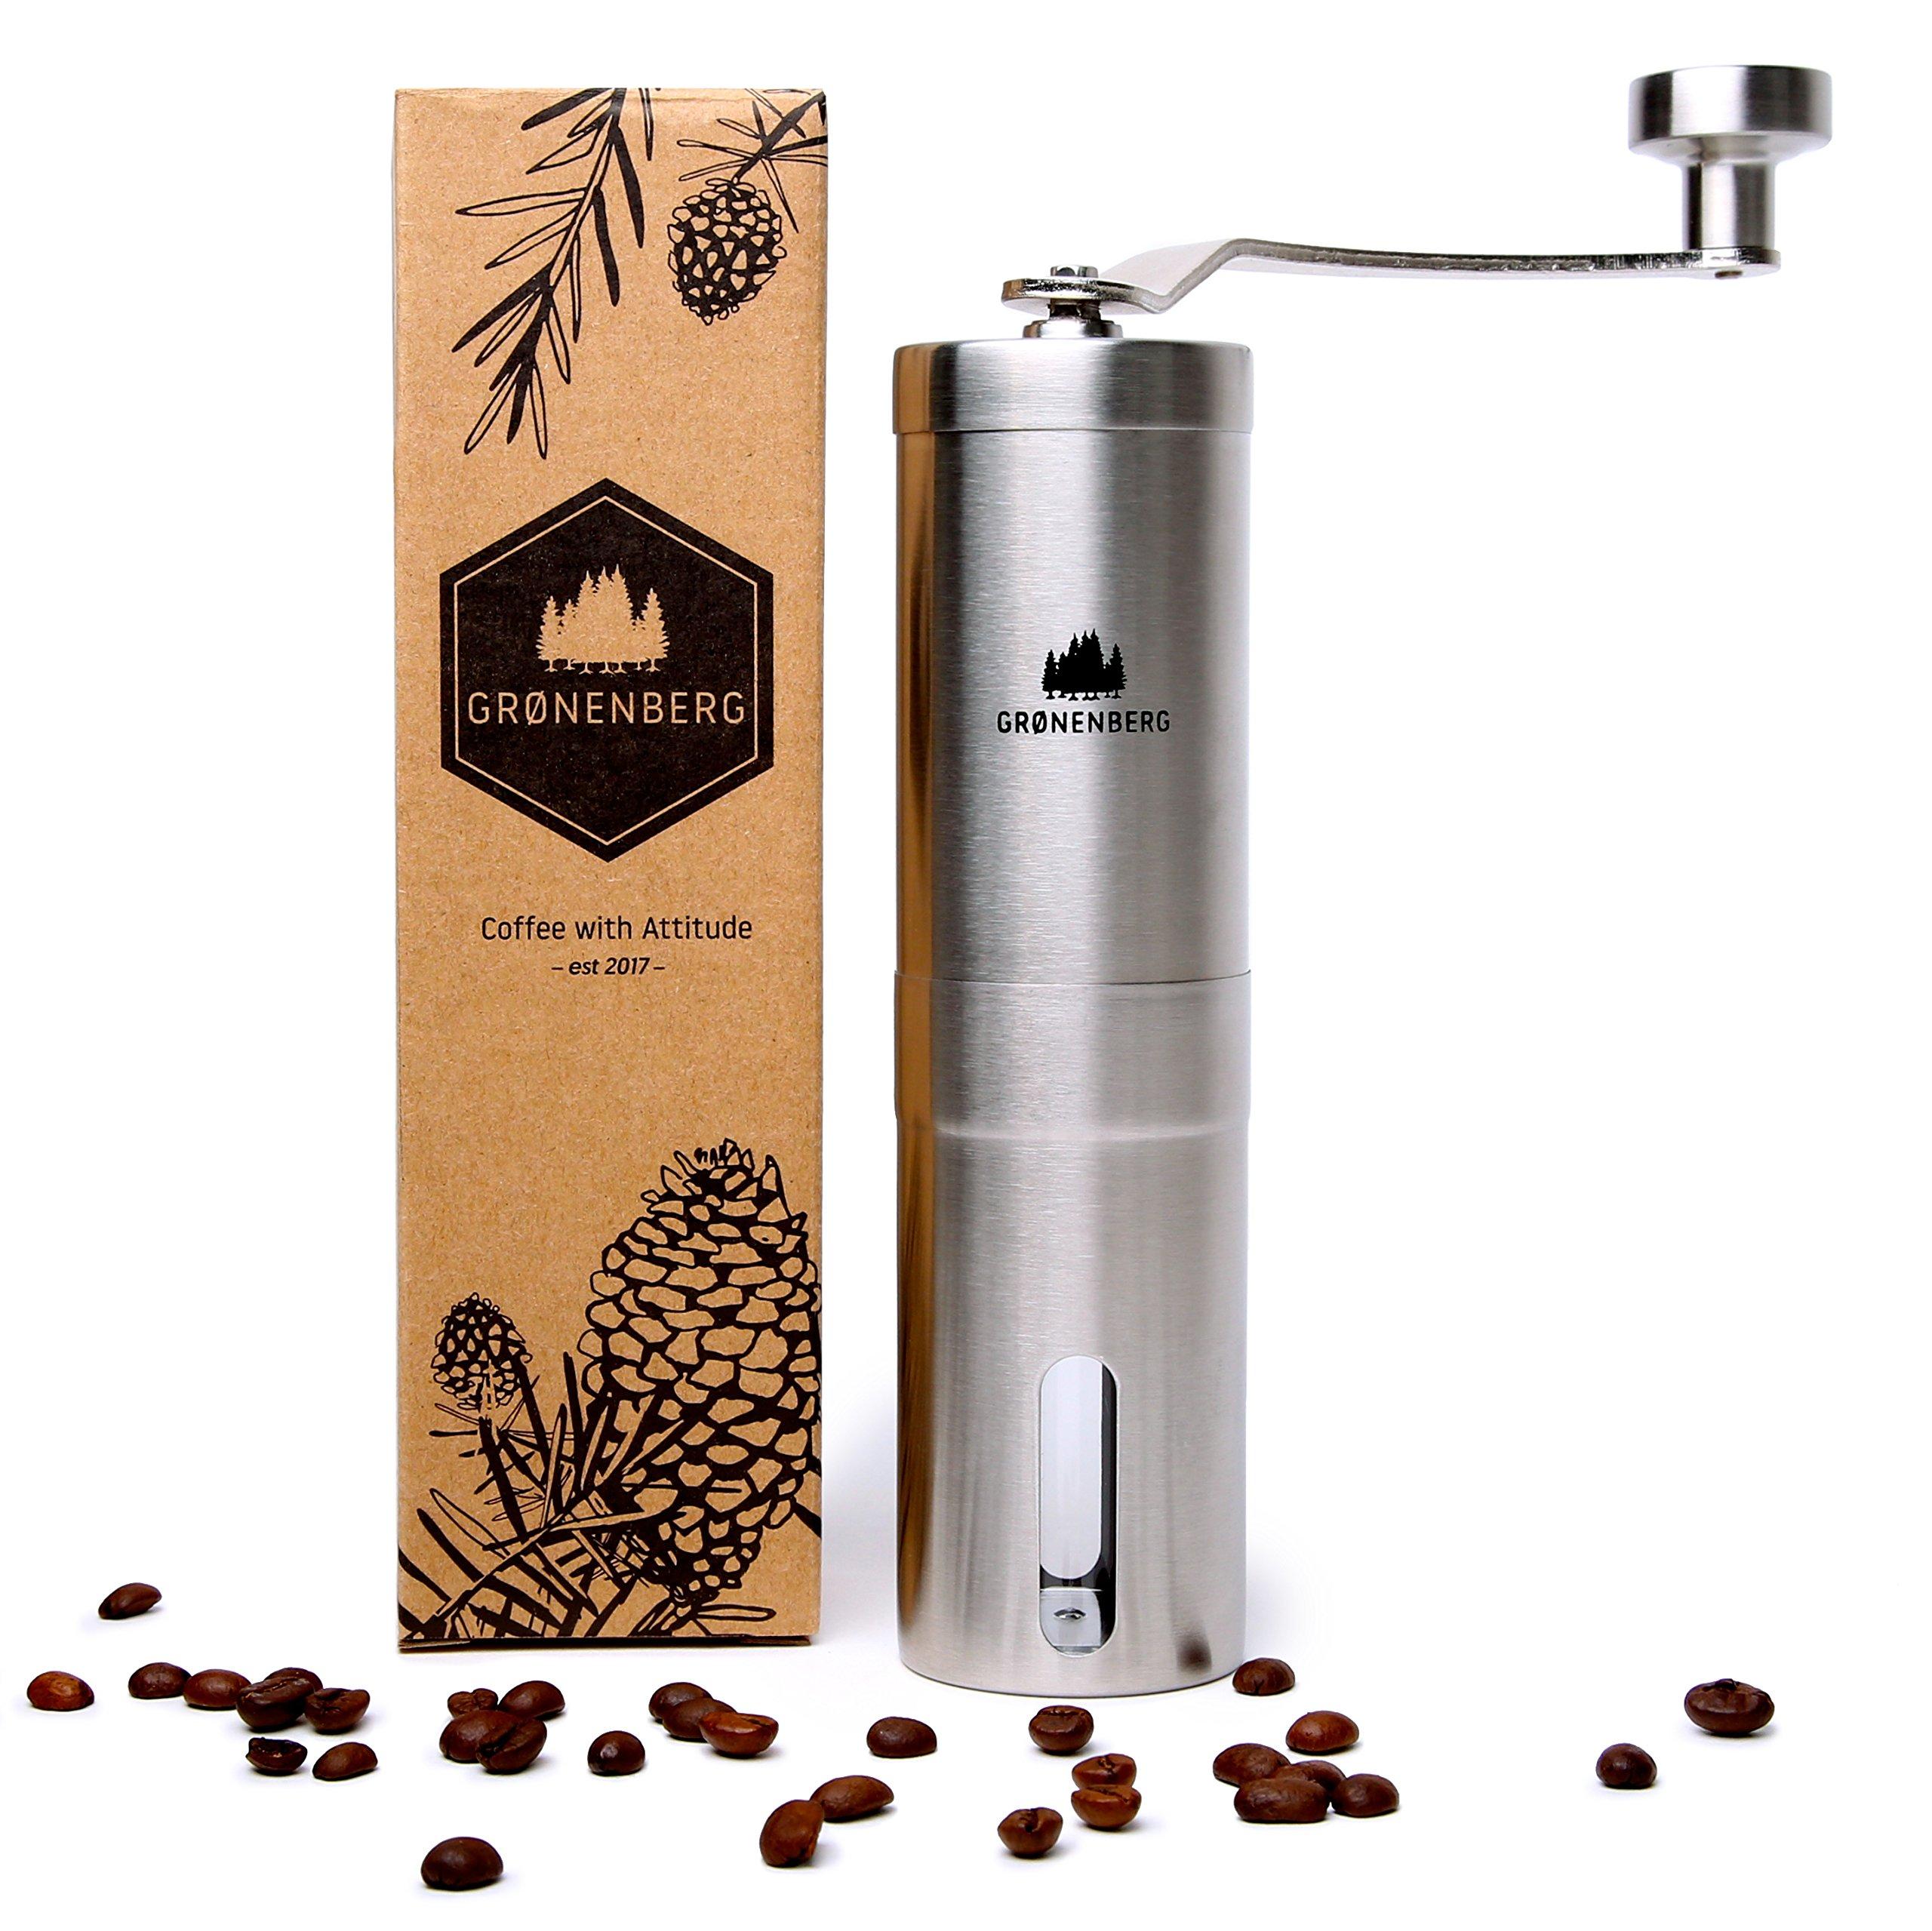 Groenenberg Kaffeemühle manuell mit Keramikmahlwerk | Kaffeemühle Hand – Handkaffeemühle aus Edelstahl | Espressomühle | Präzise Mahlgradeinstellung stufenlos | Manuelle Kaffeemühle